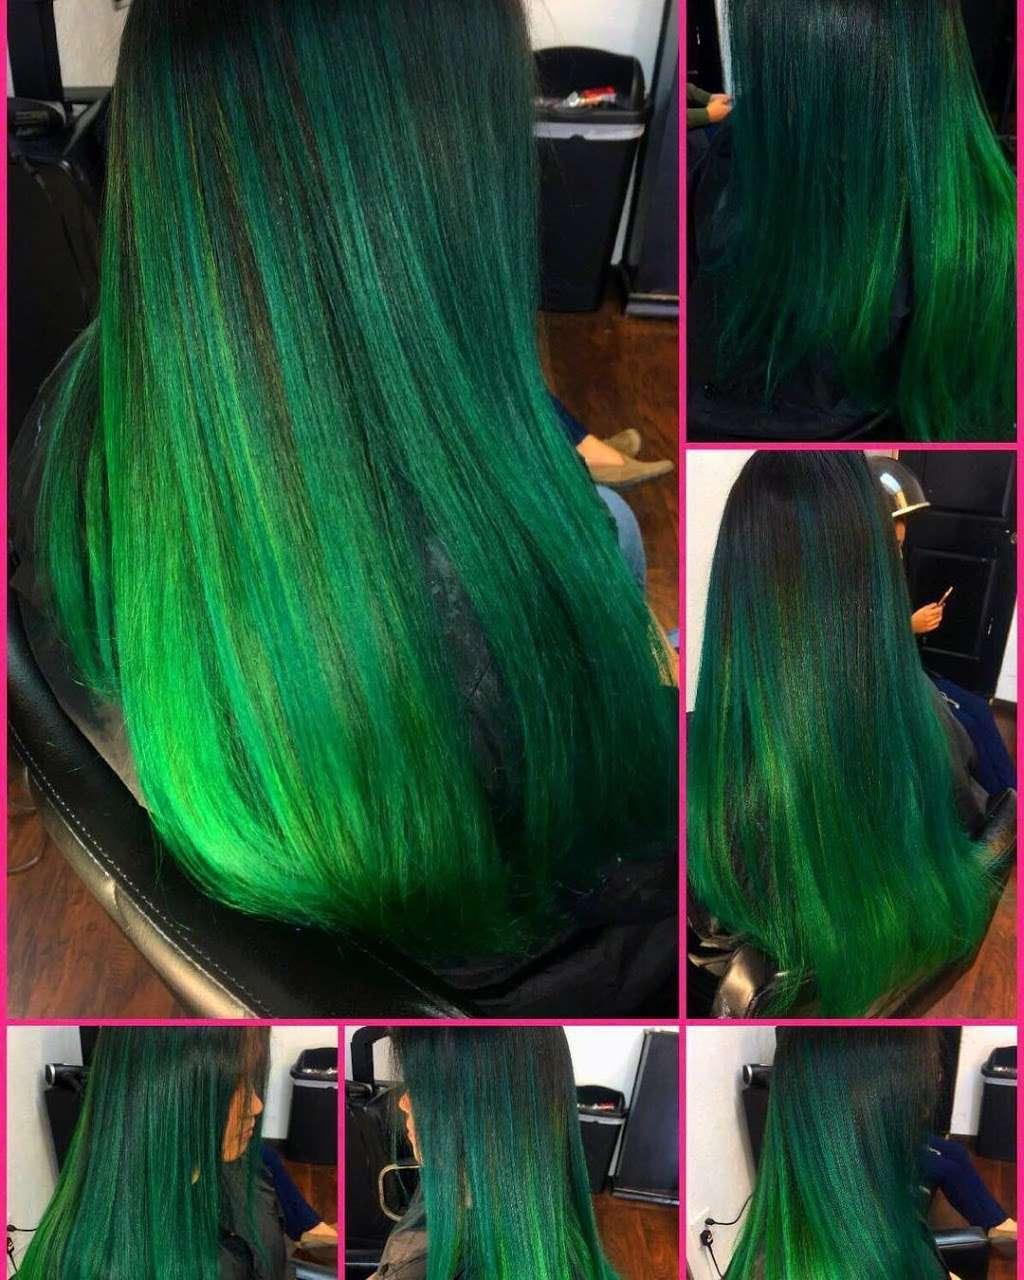 Jan Fher Hair Designer studio - hair care    Photo 1 of 10   Address: 842 S Galloway Ave, Mesquite, TX 75149, USA   Phone: (972) 322-9373